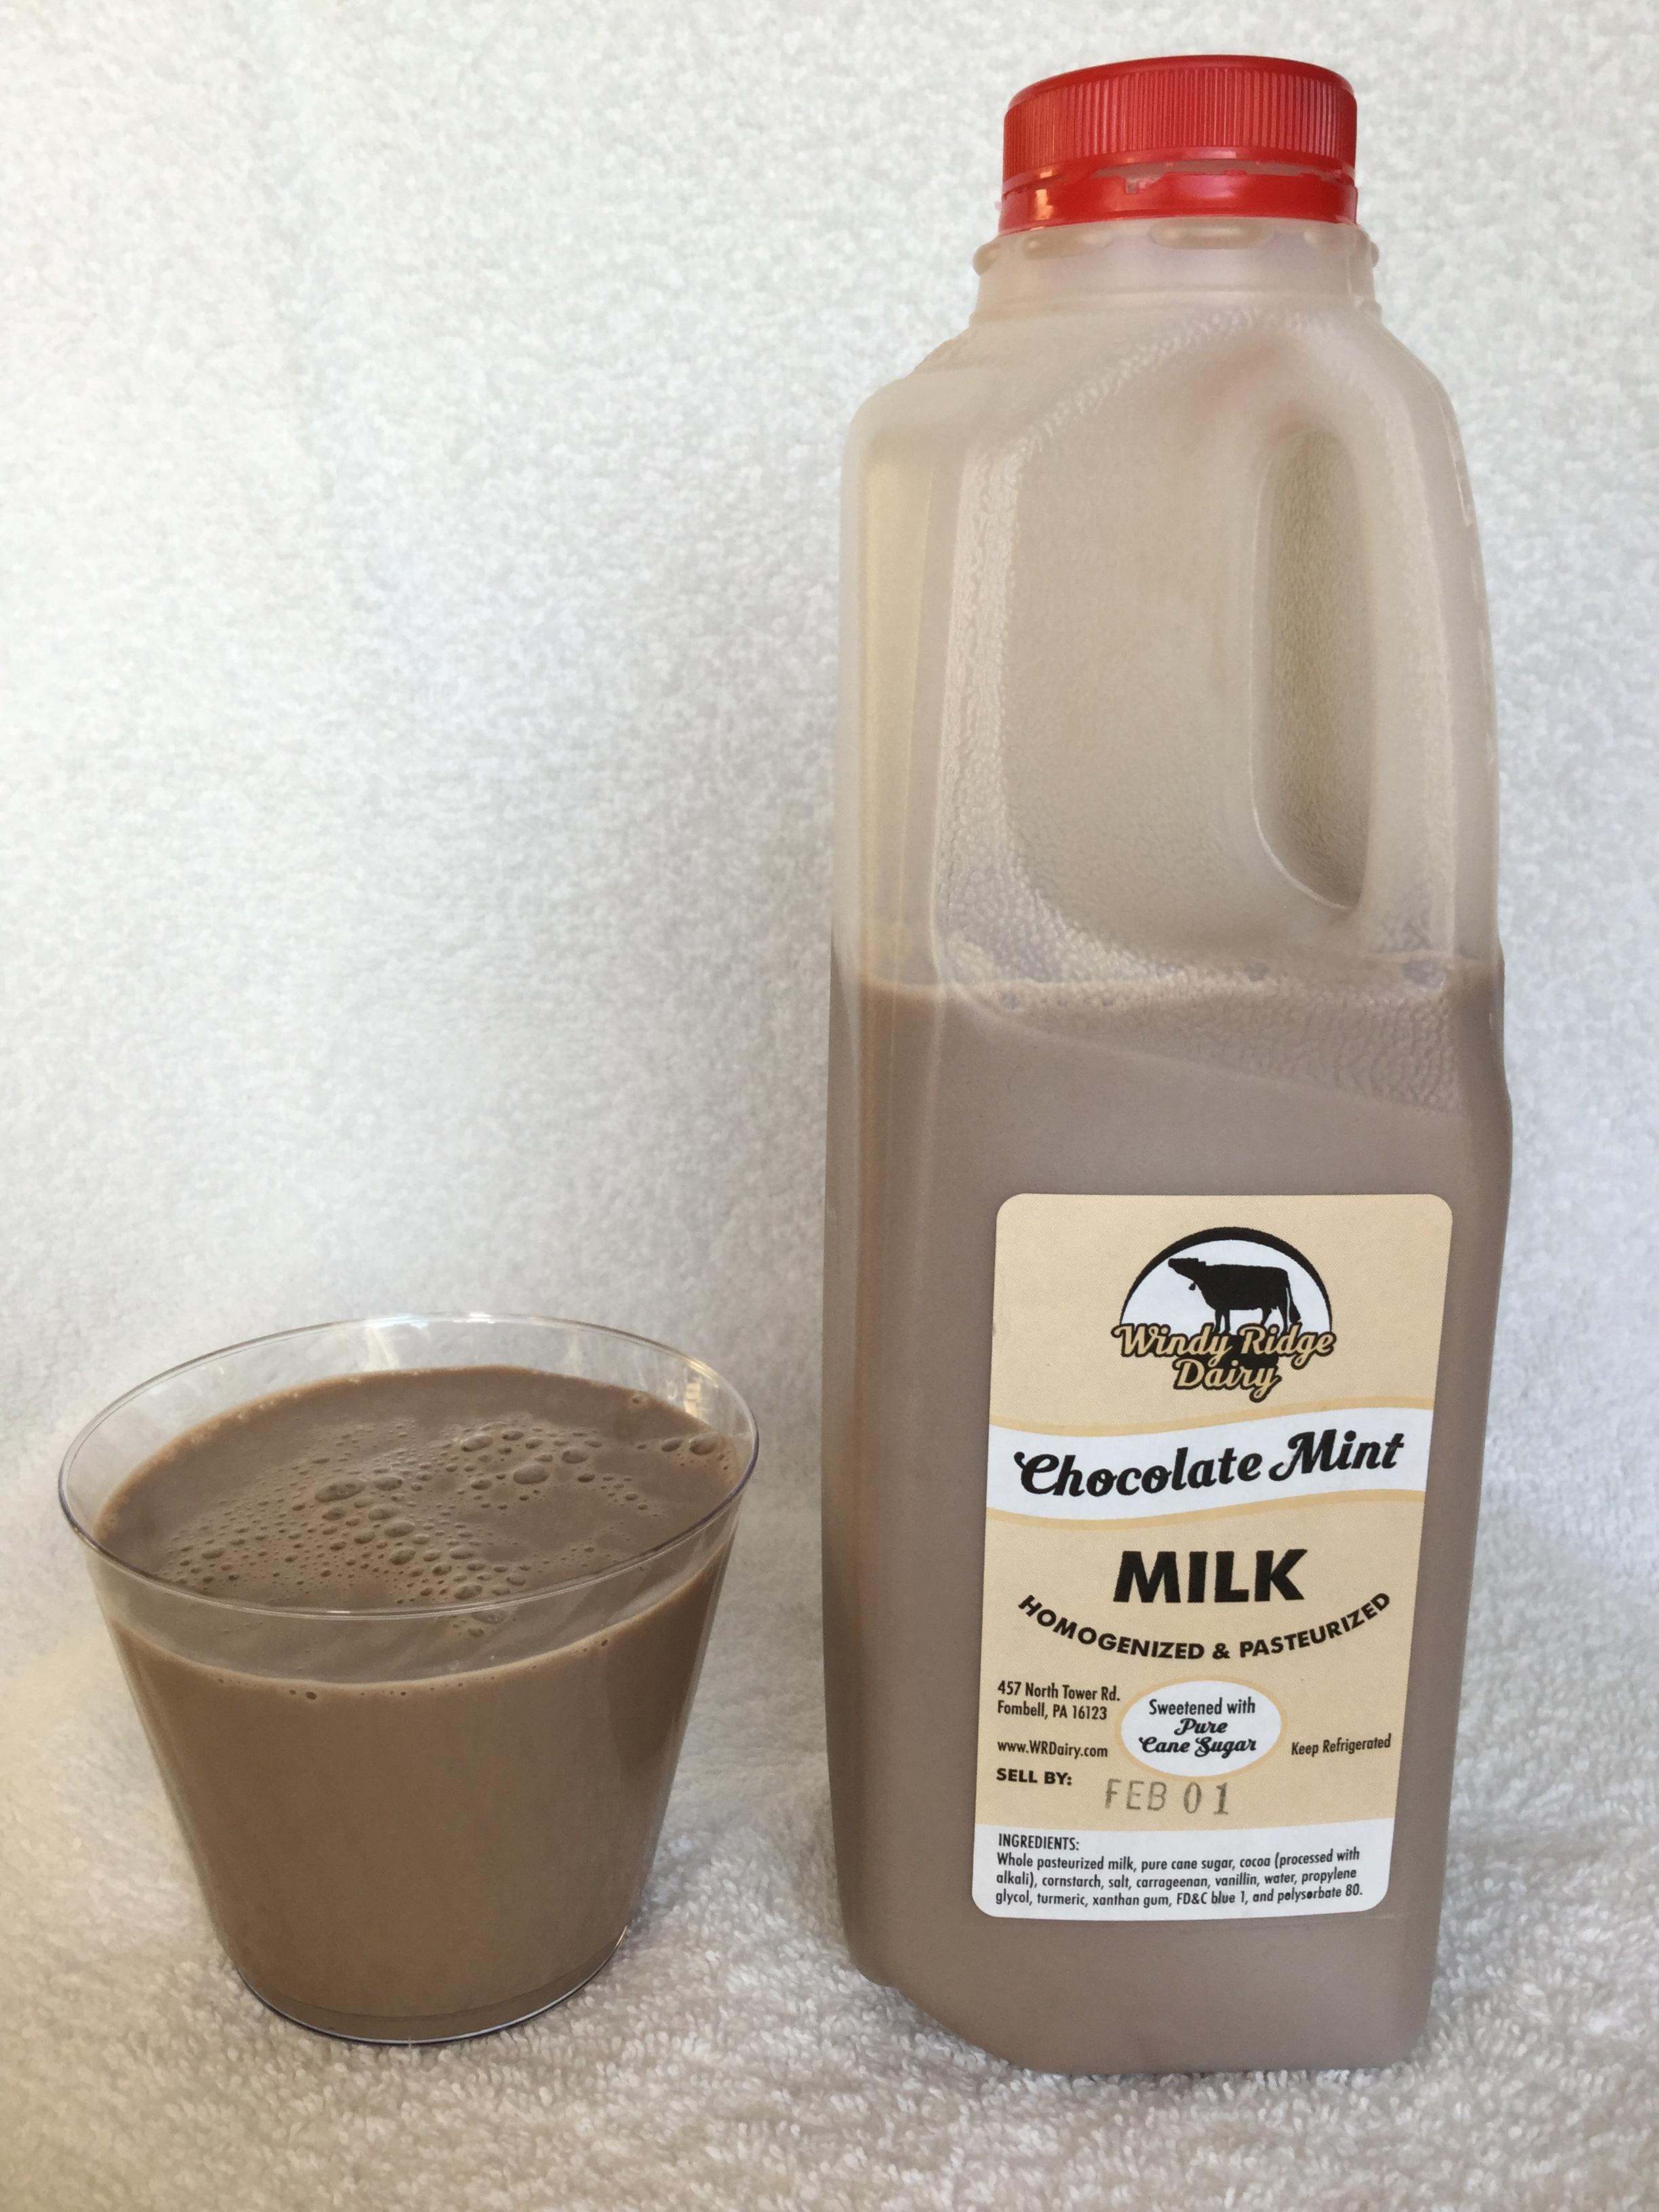 Windy Ridge Dairy Chocolate Mint Milk Cup